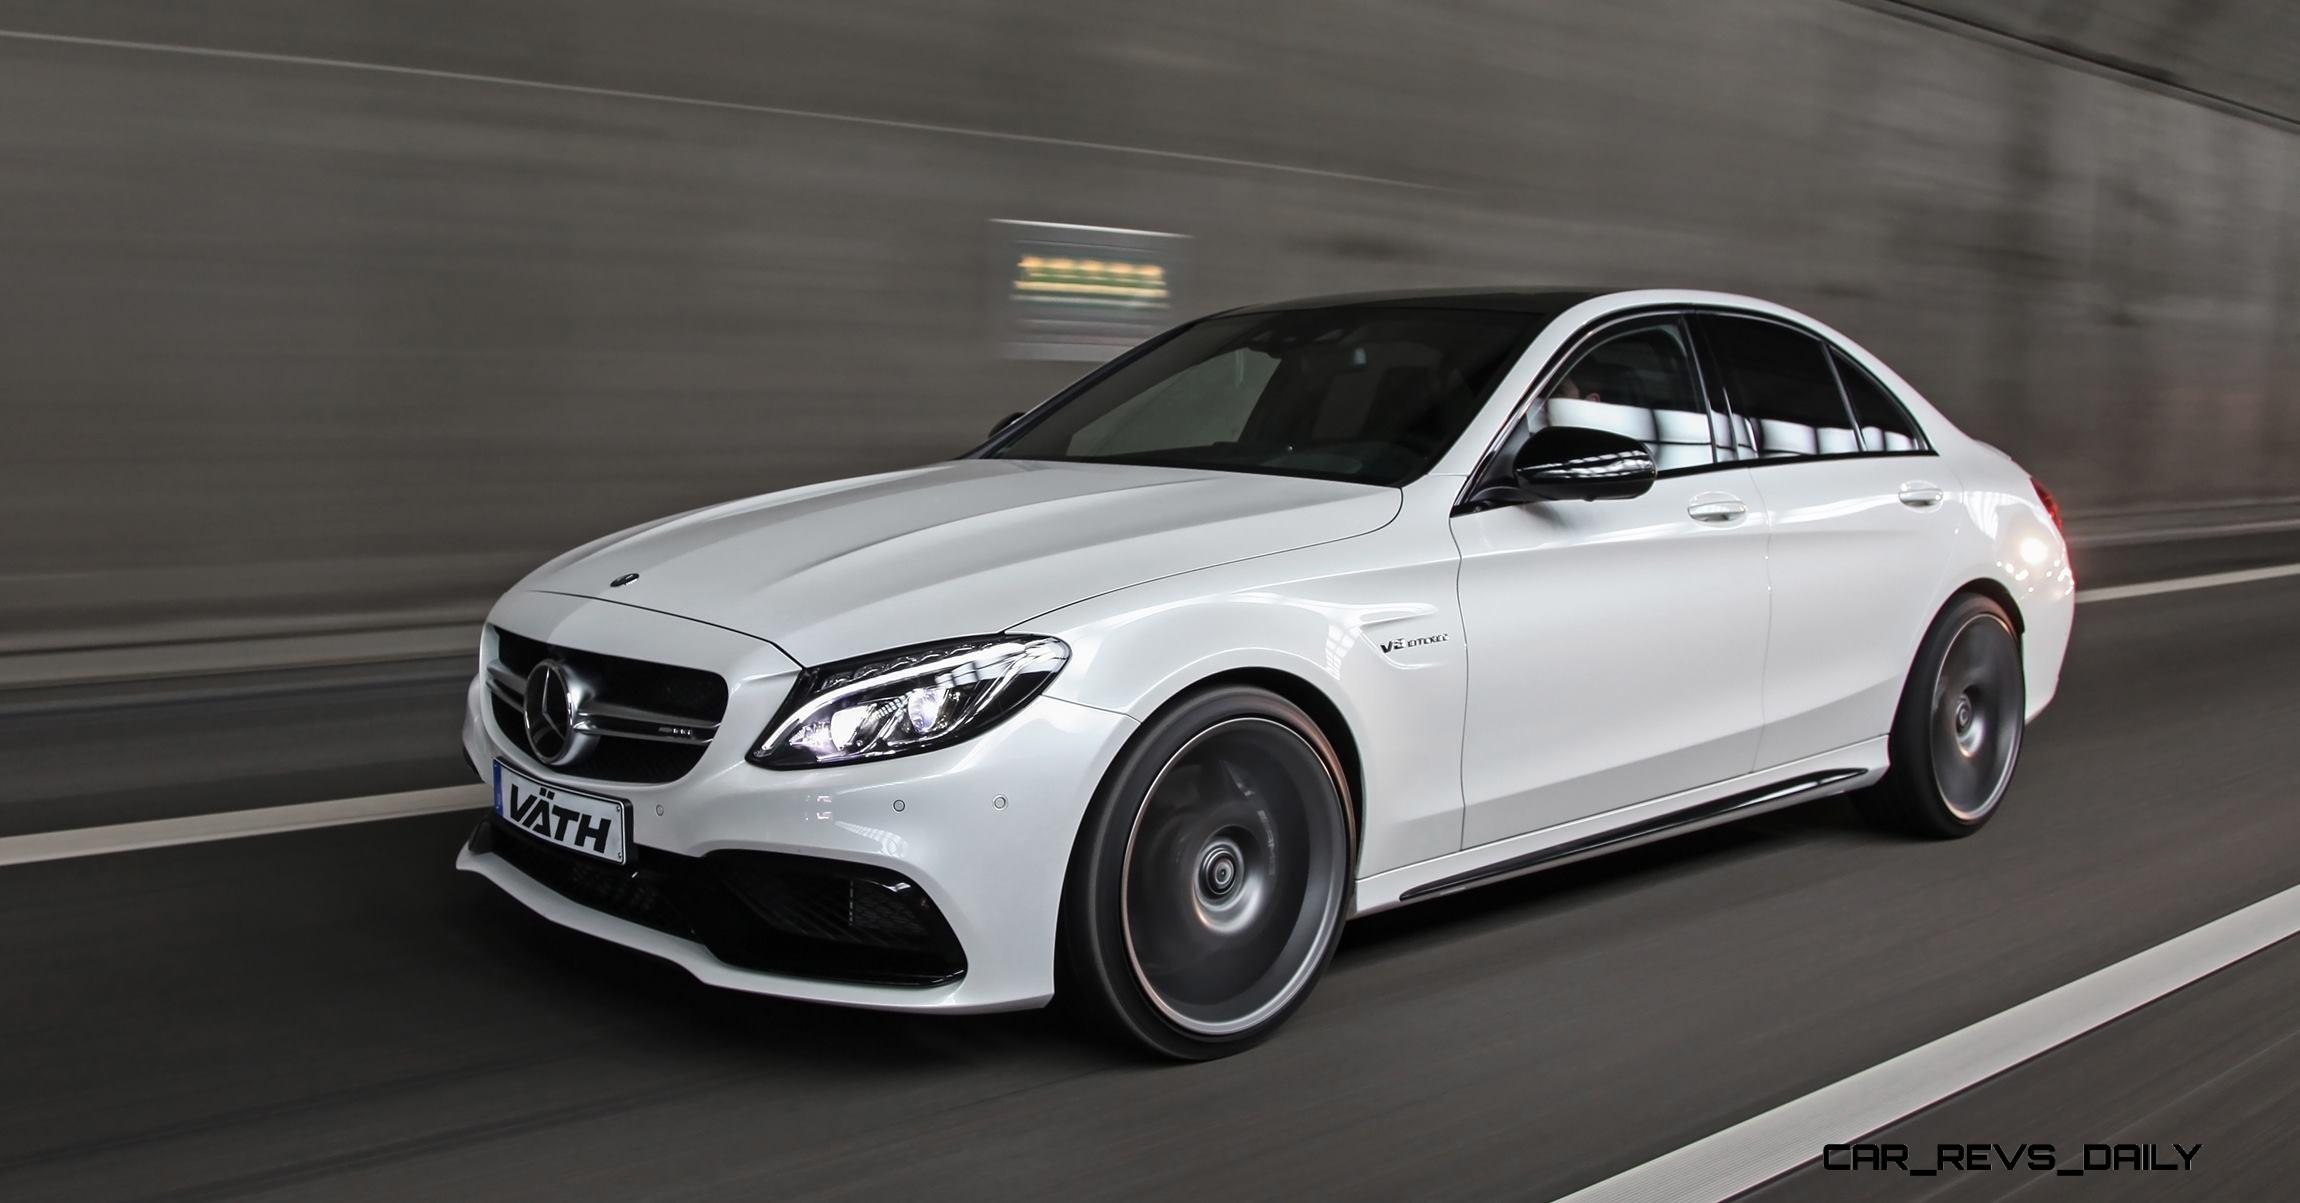 680HP, 199MPH 2016 VÄTH Mercedes-AMG C63-RS Delivers Massive ...